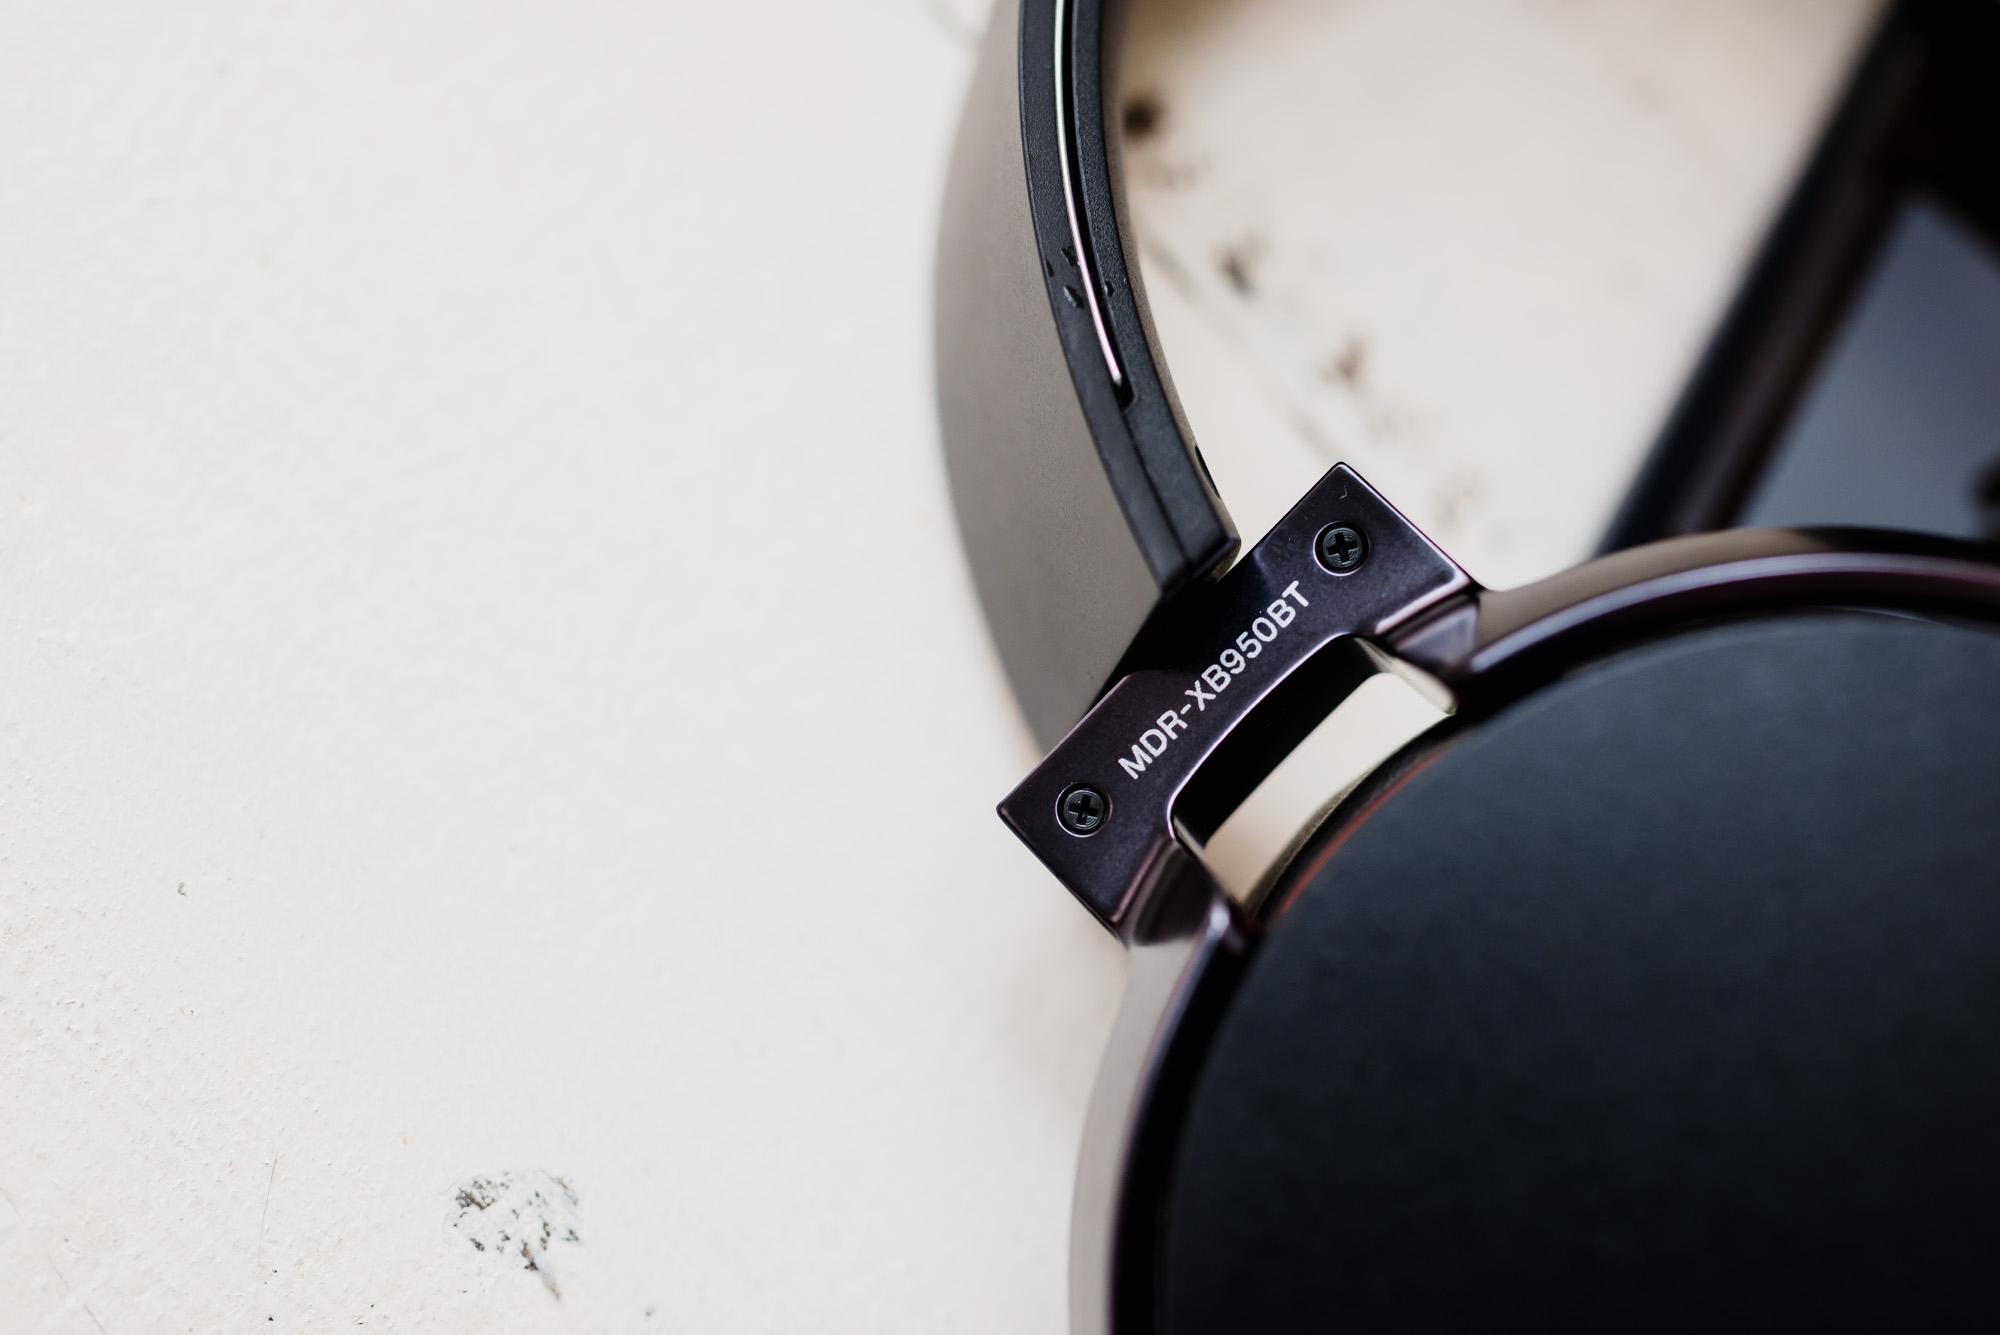 sony-xb950bt-extra-bass-11